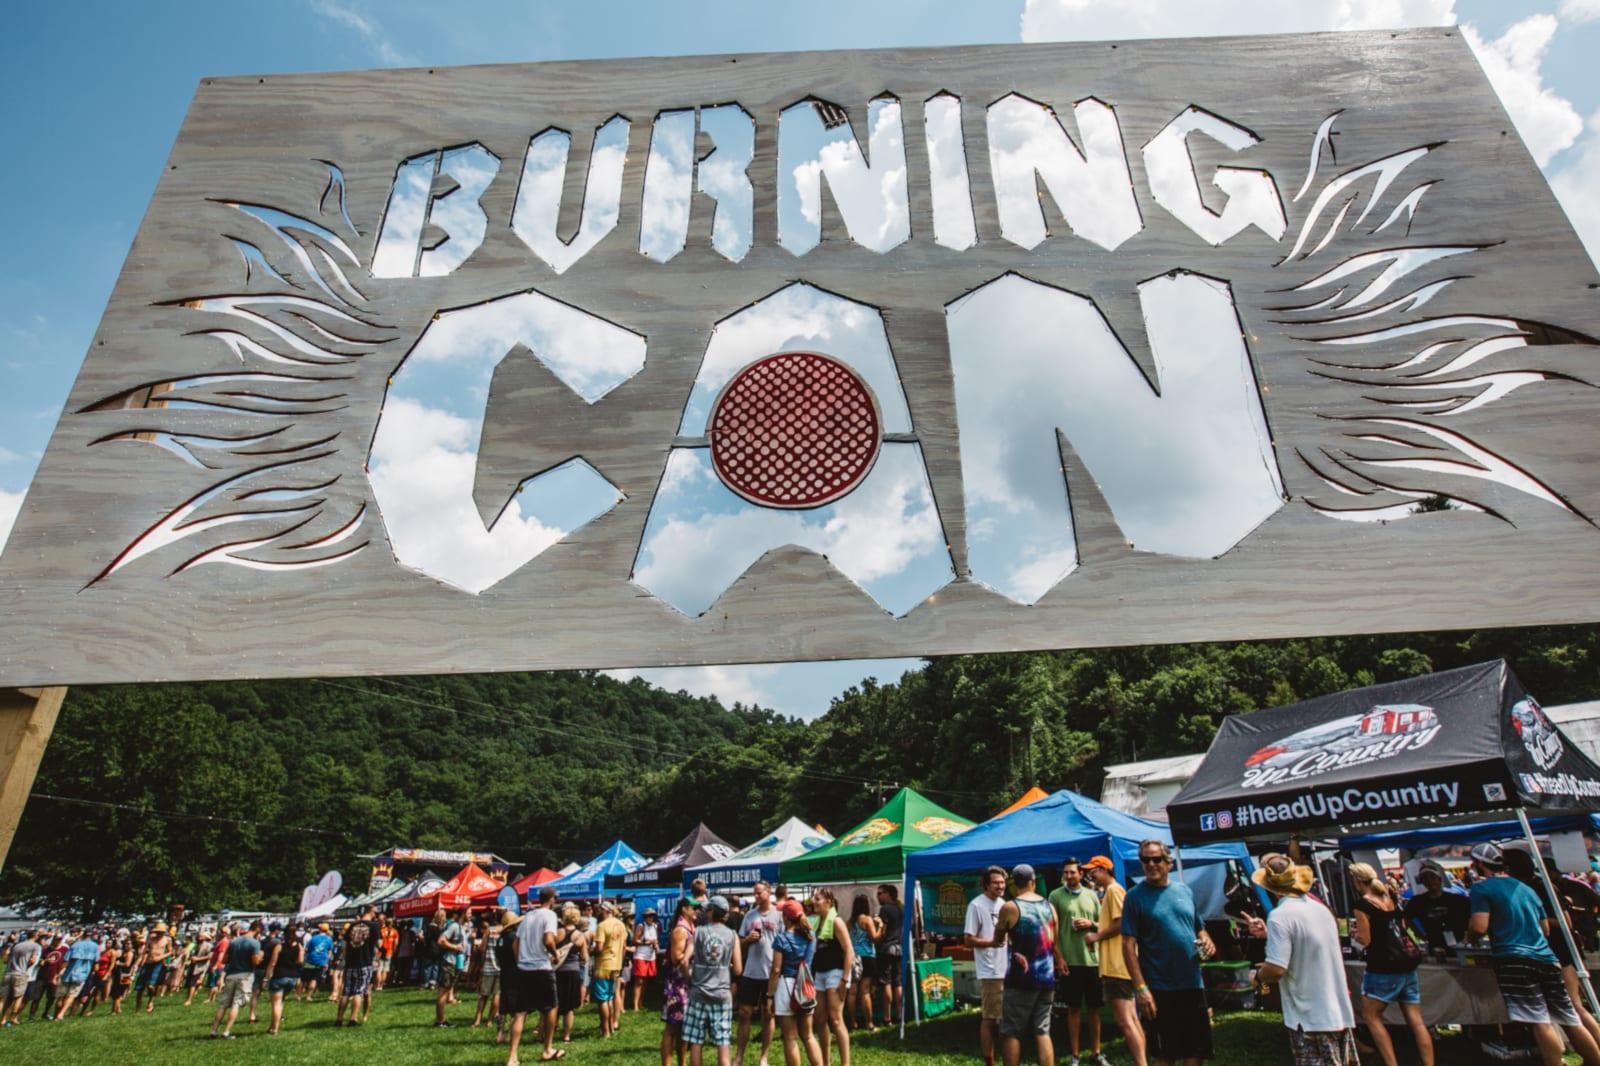 Burning Can Festival